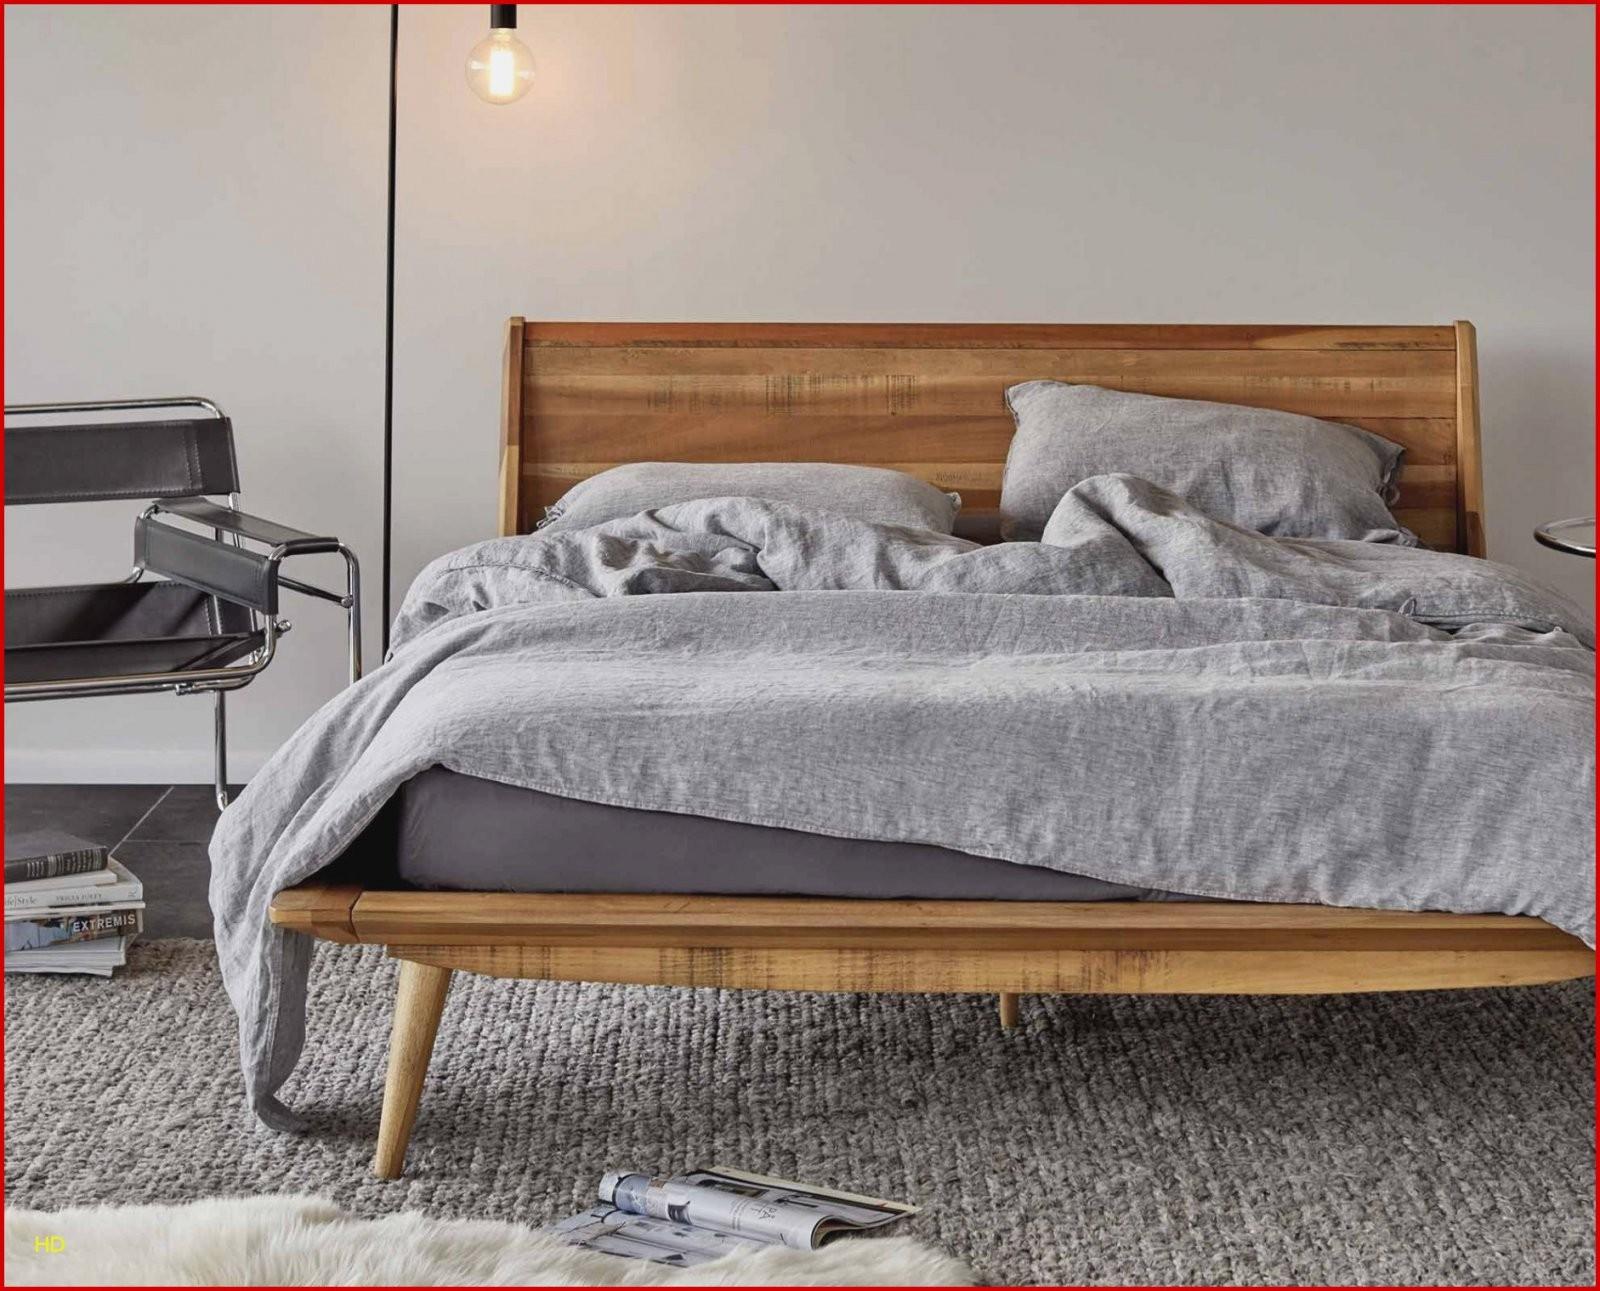 Betten Kolonialstil 835752 19 Fresh Bett Kolonialstil 160X200 von Kolonial Bett 160X200 Photo